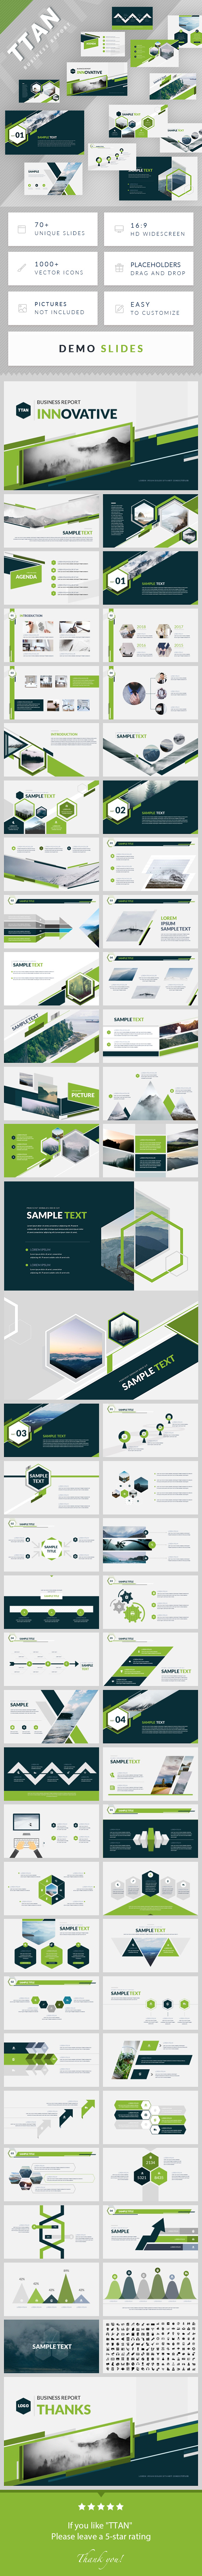 TTAN - PowerPoint Presentation Template